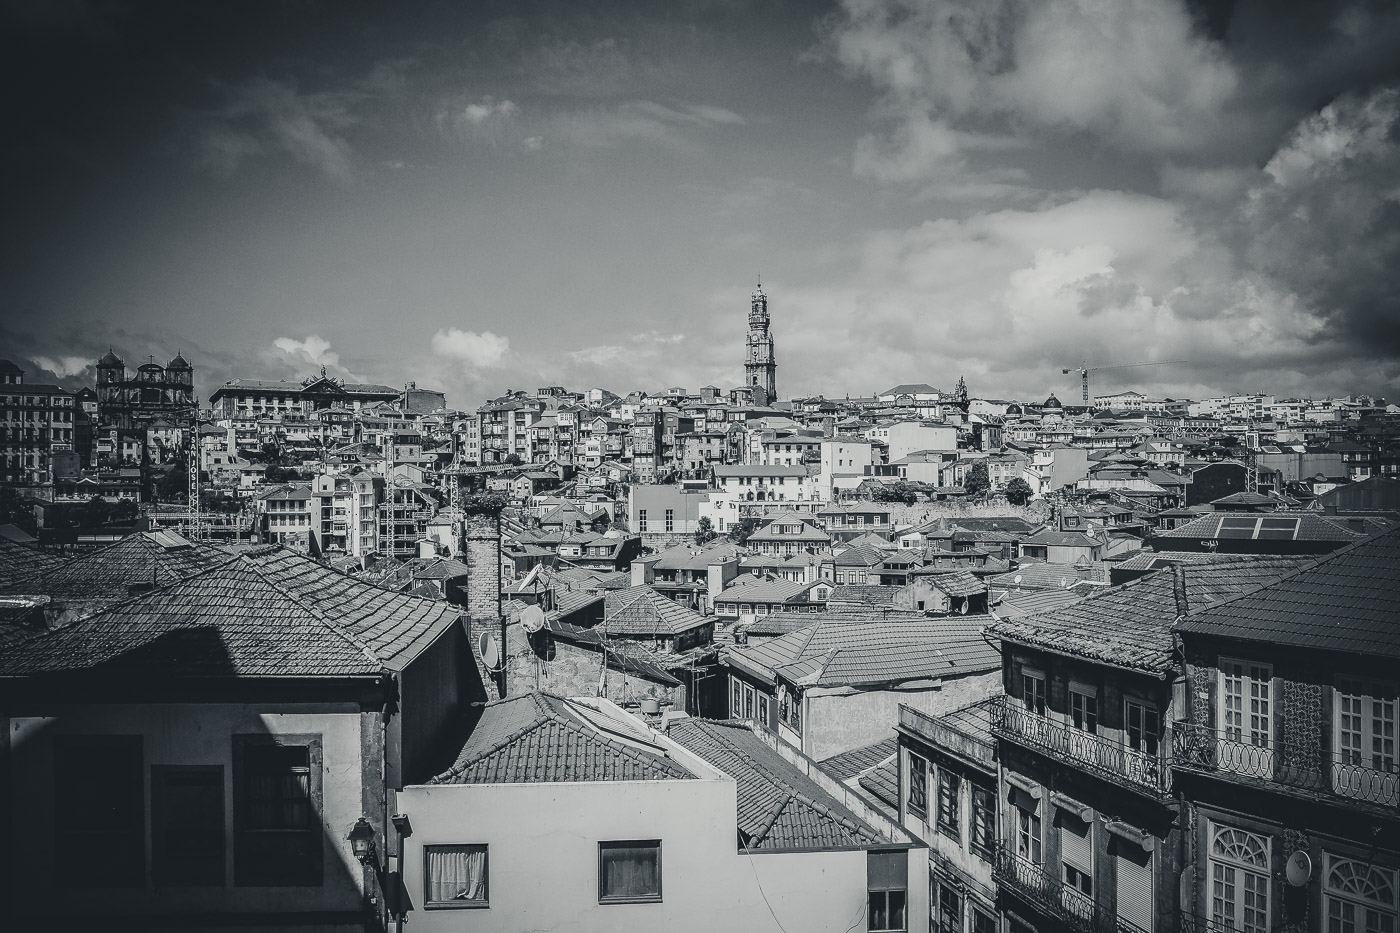 hb images - Porto - b-w street buildings